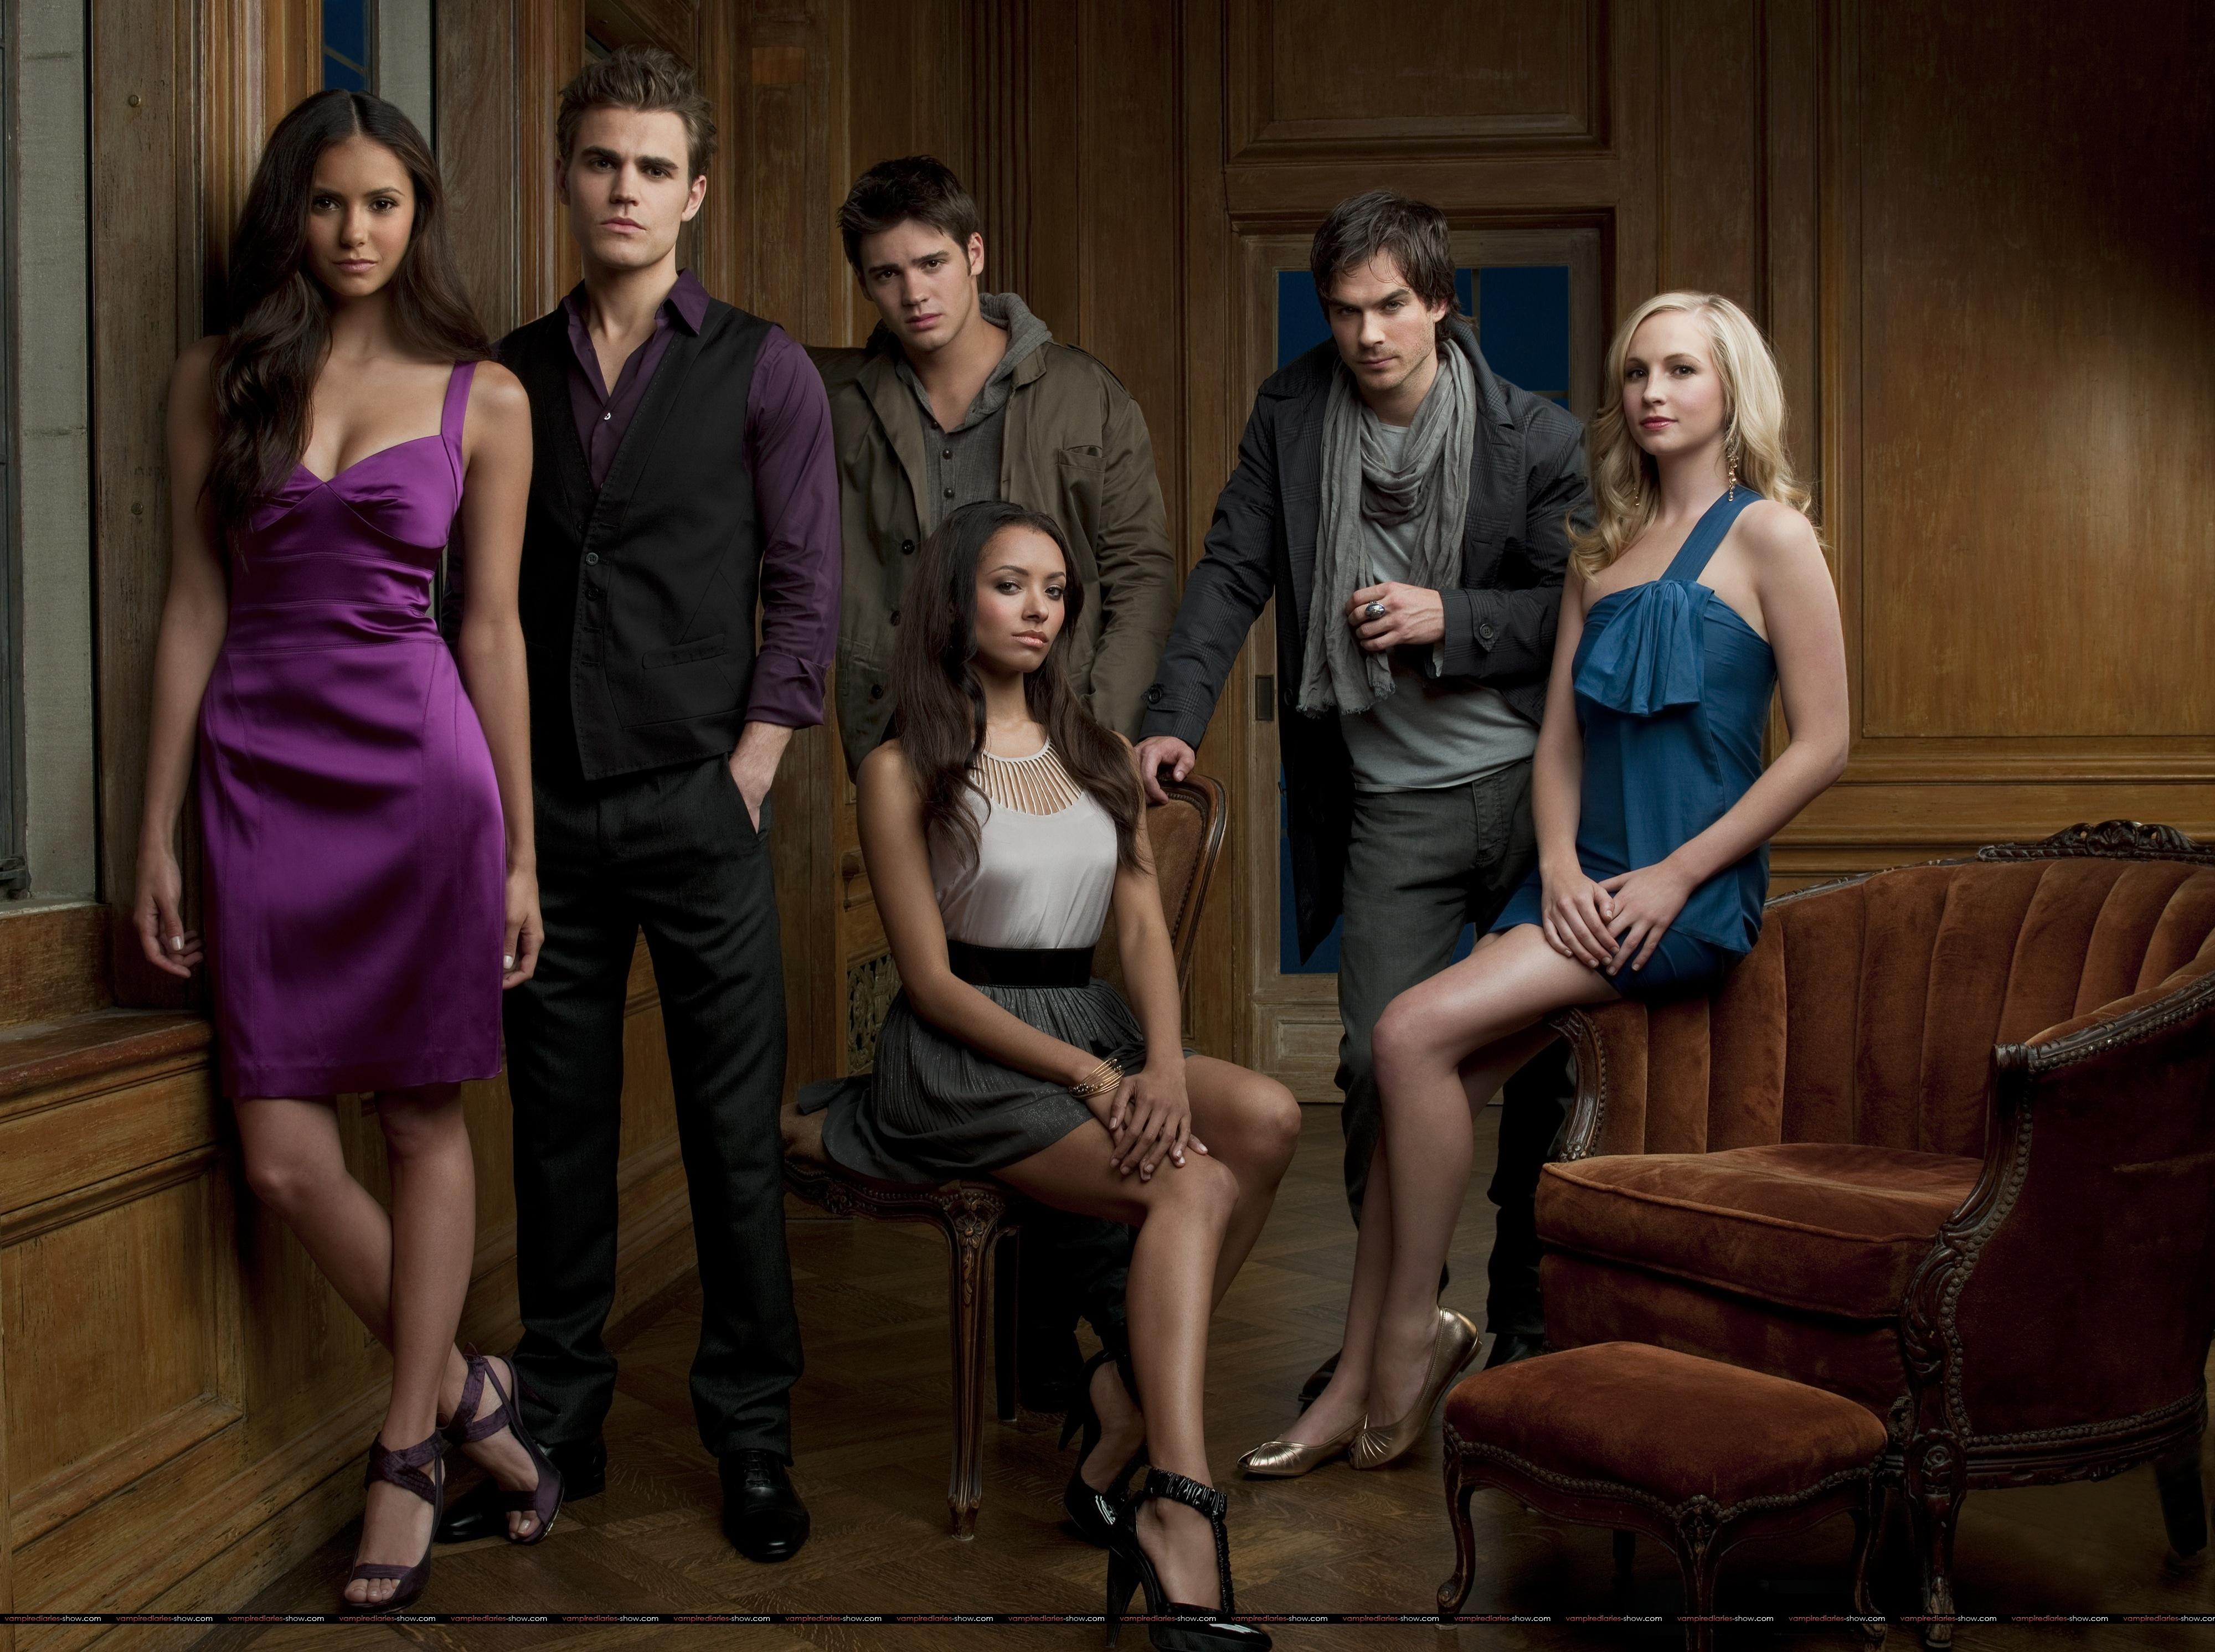 http://www.vampire-diaries.fr/wp-content/uploads/2009/09/vampire-diaries-season-1-fond-ecran-groupe.jpg